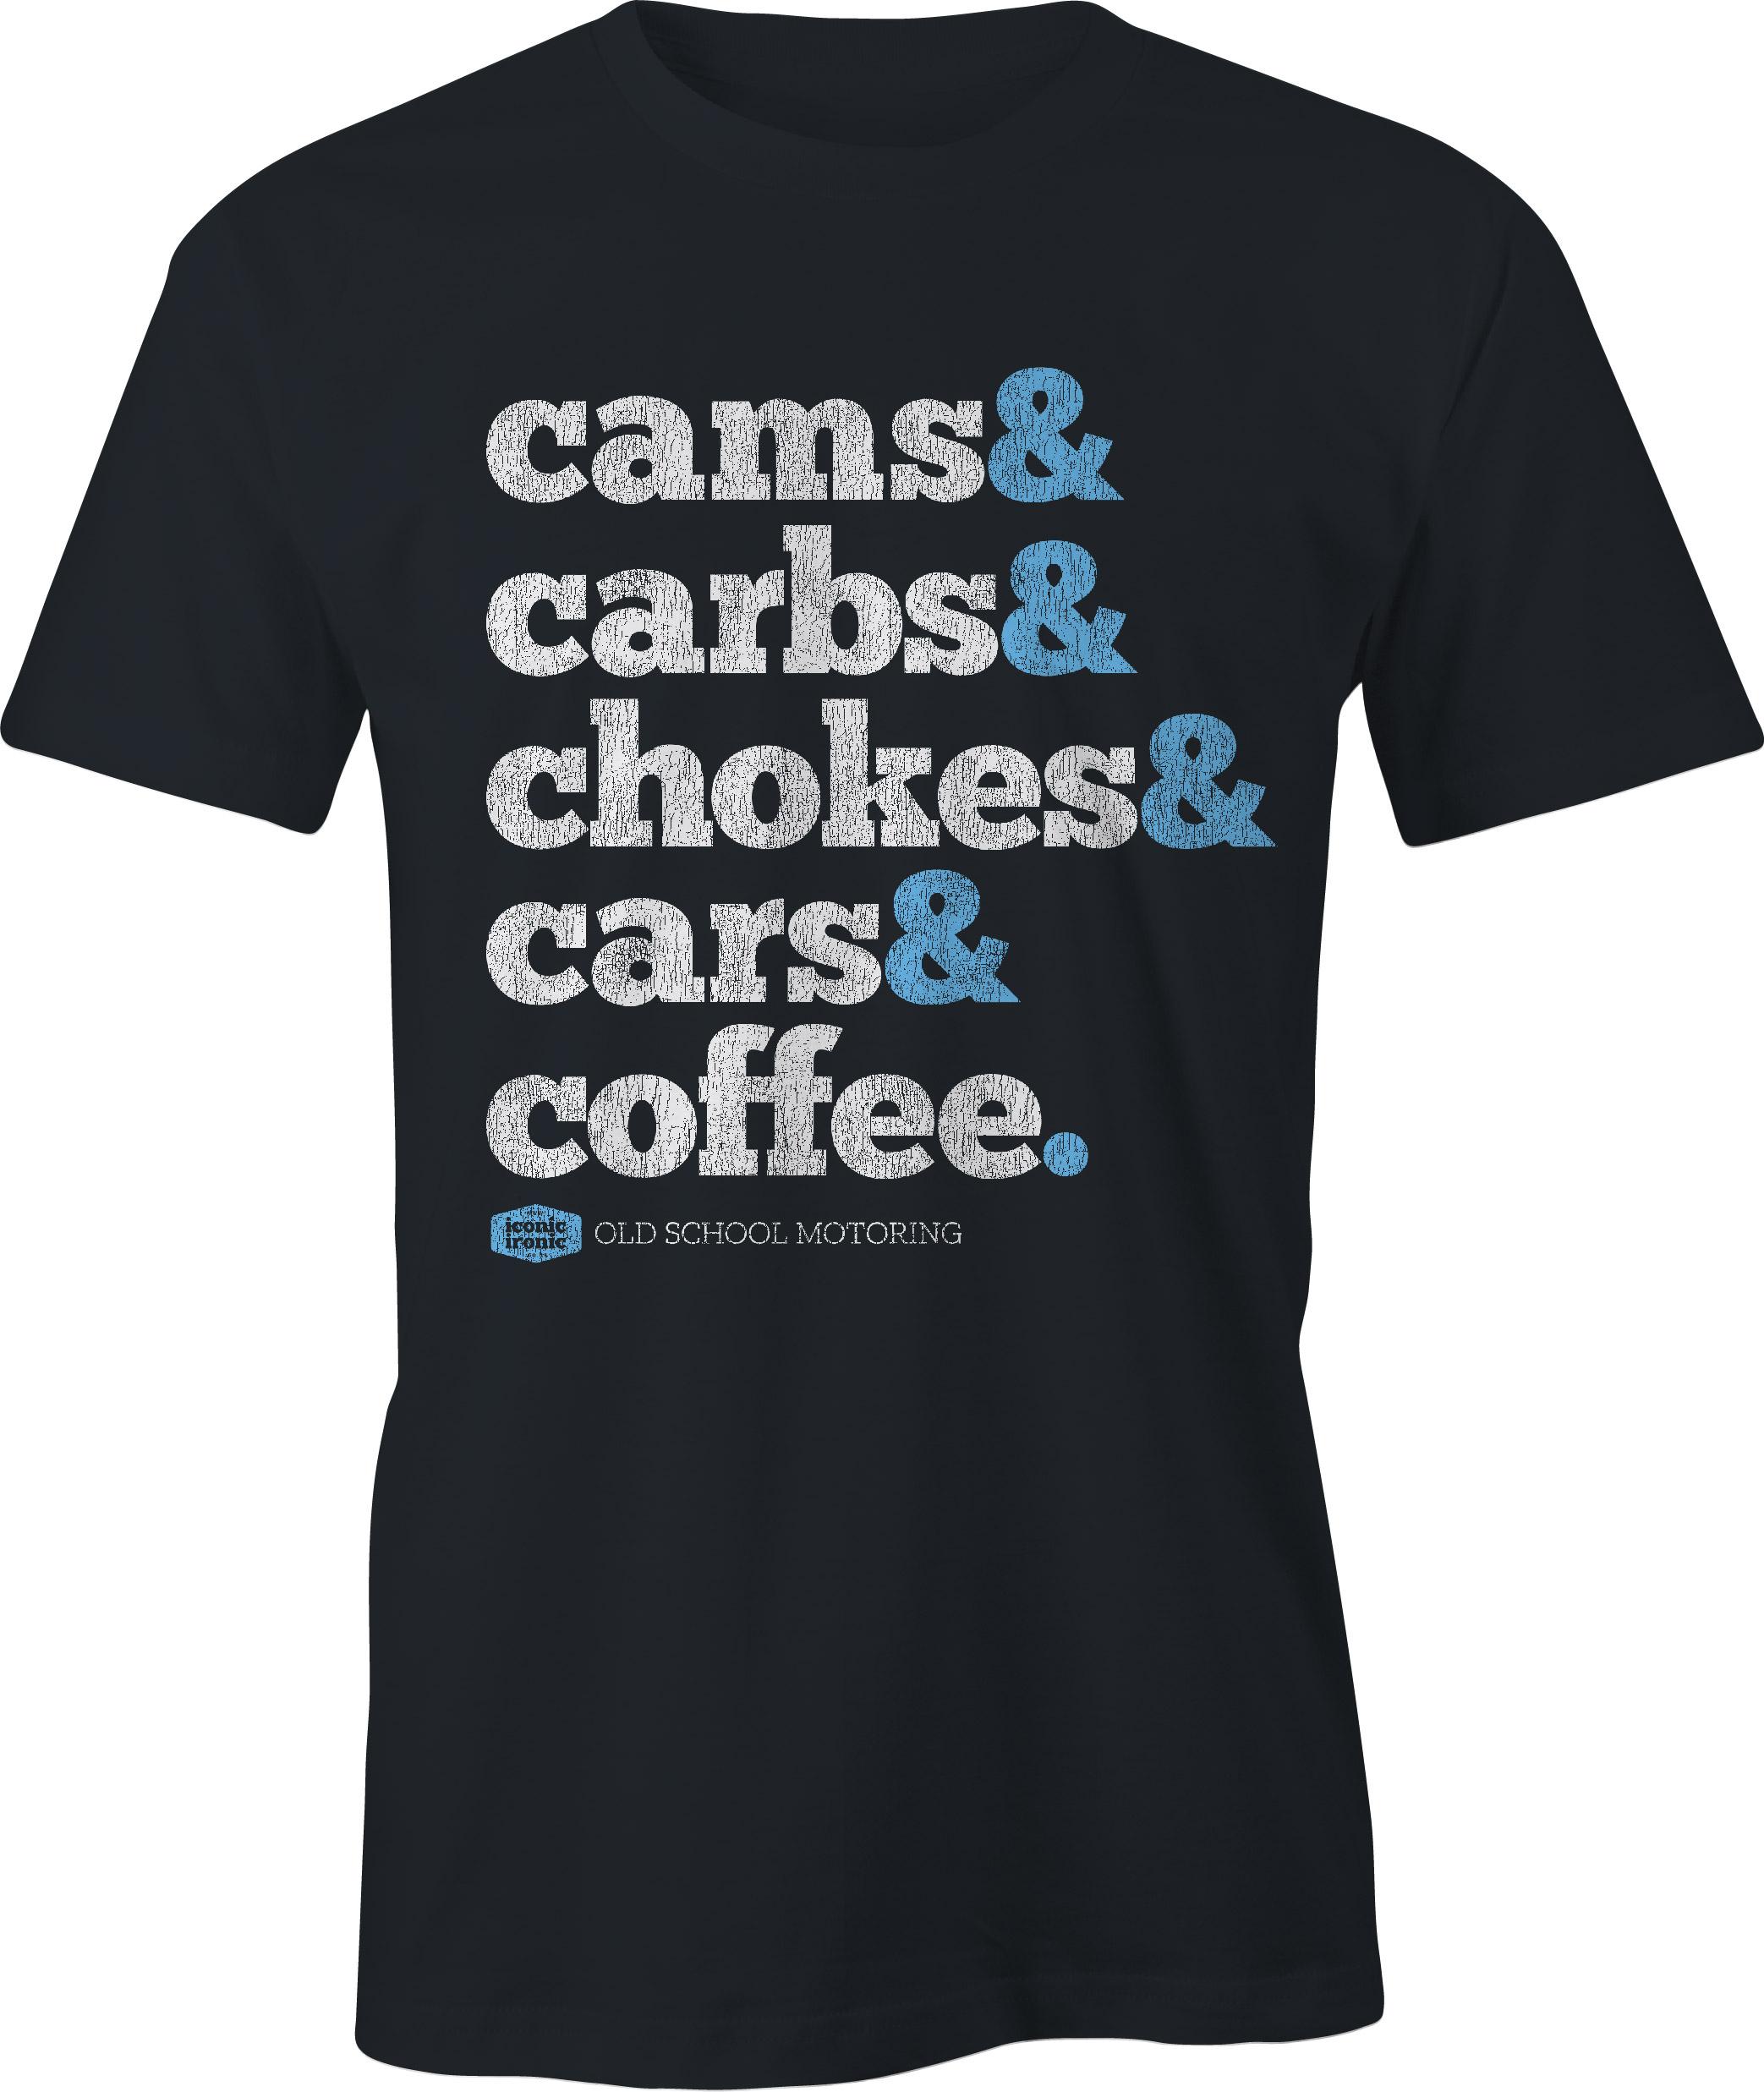 Cams & Carbs Wording Black T Shirt